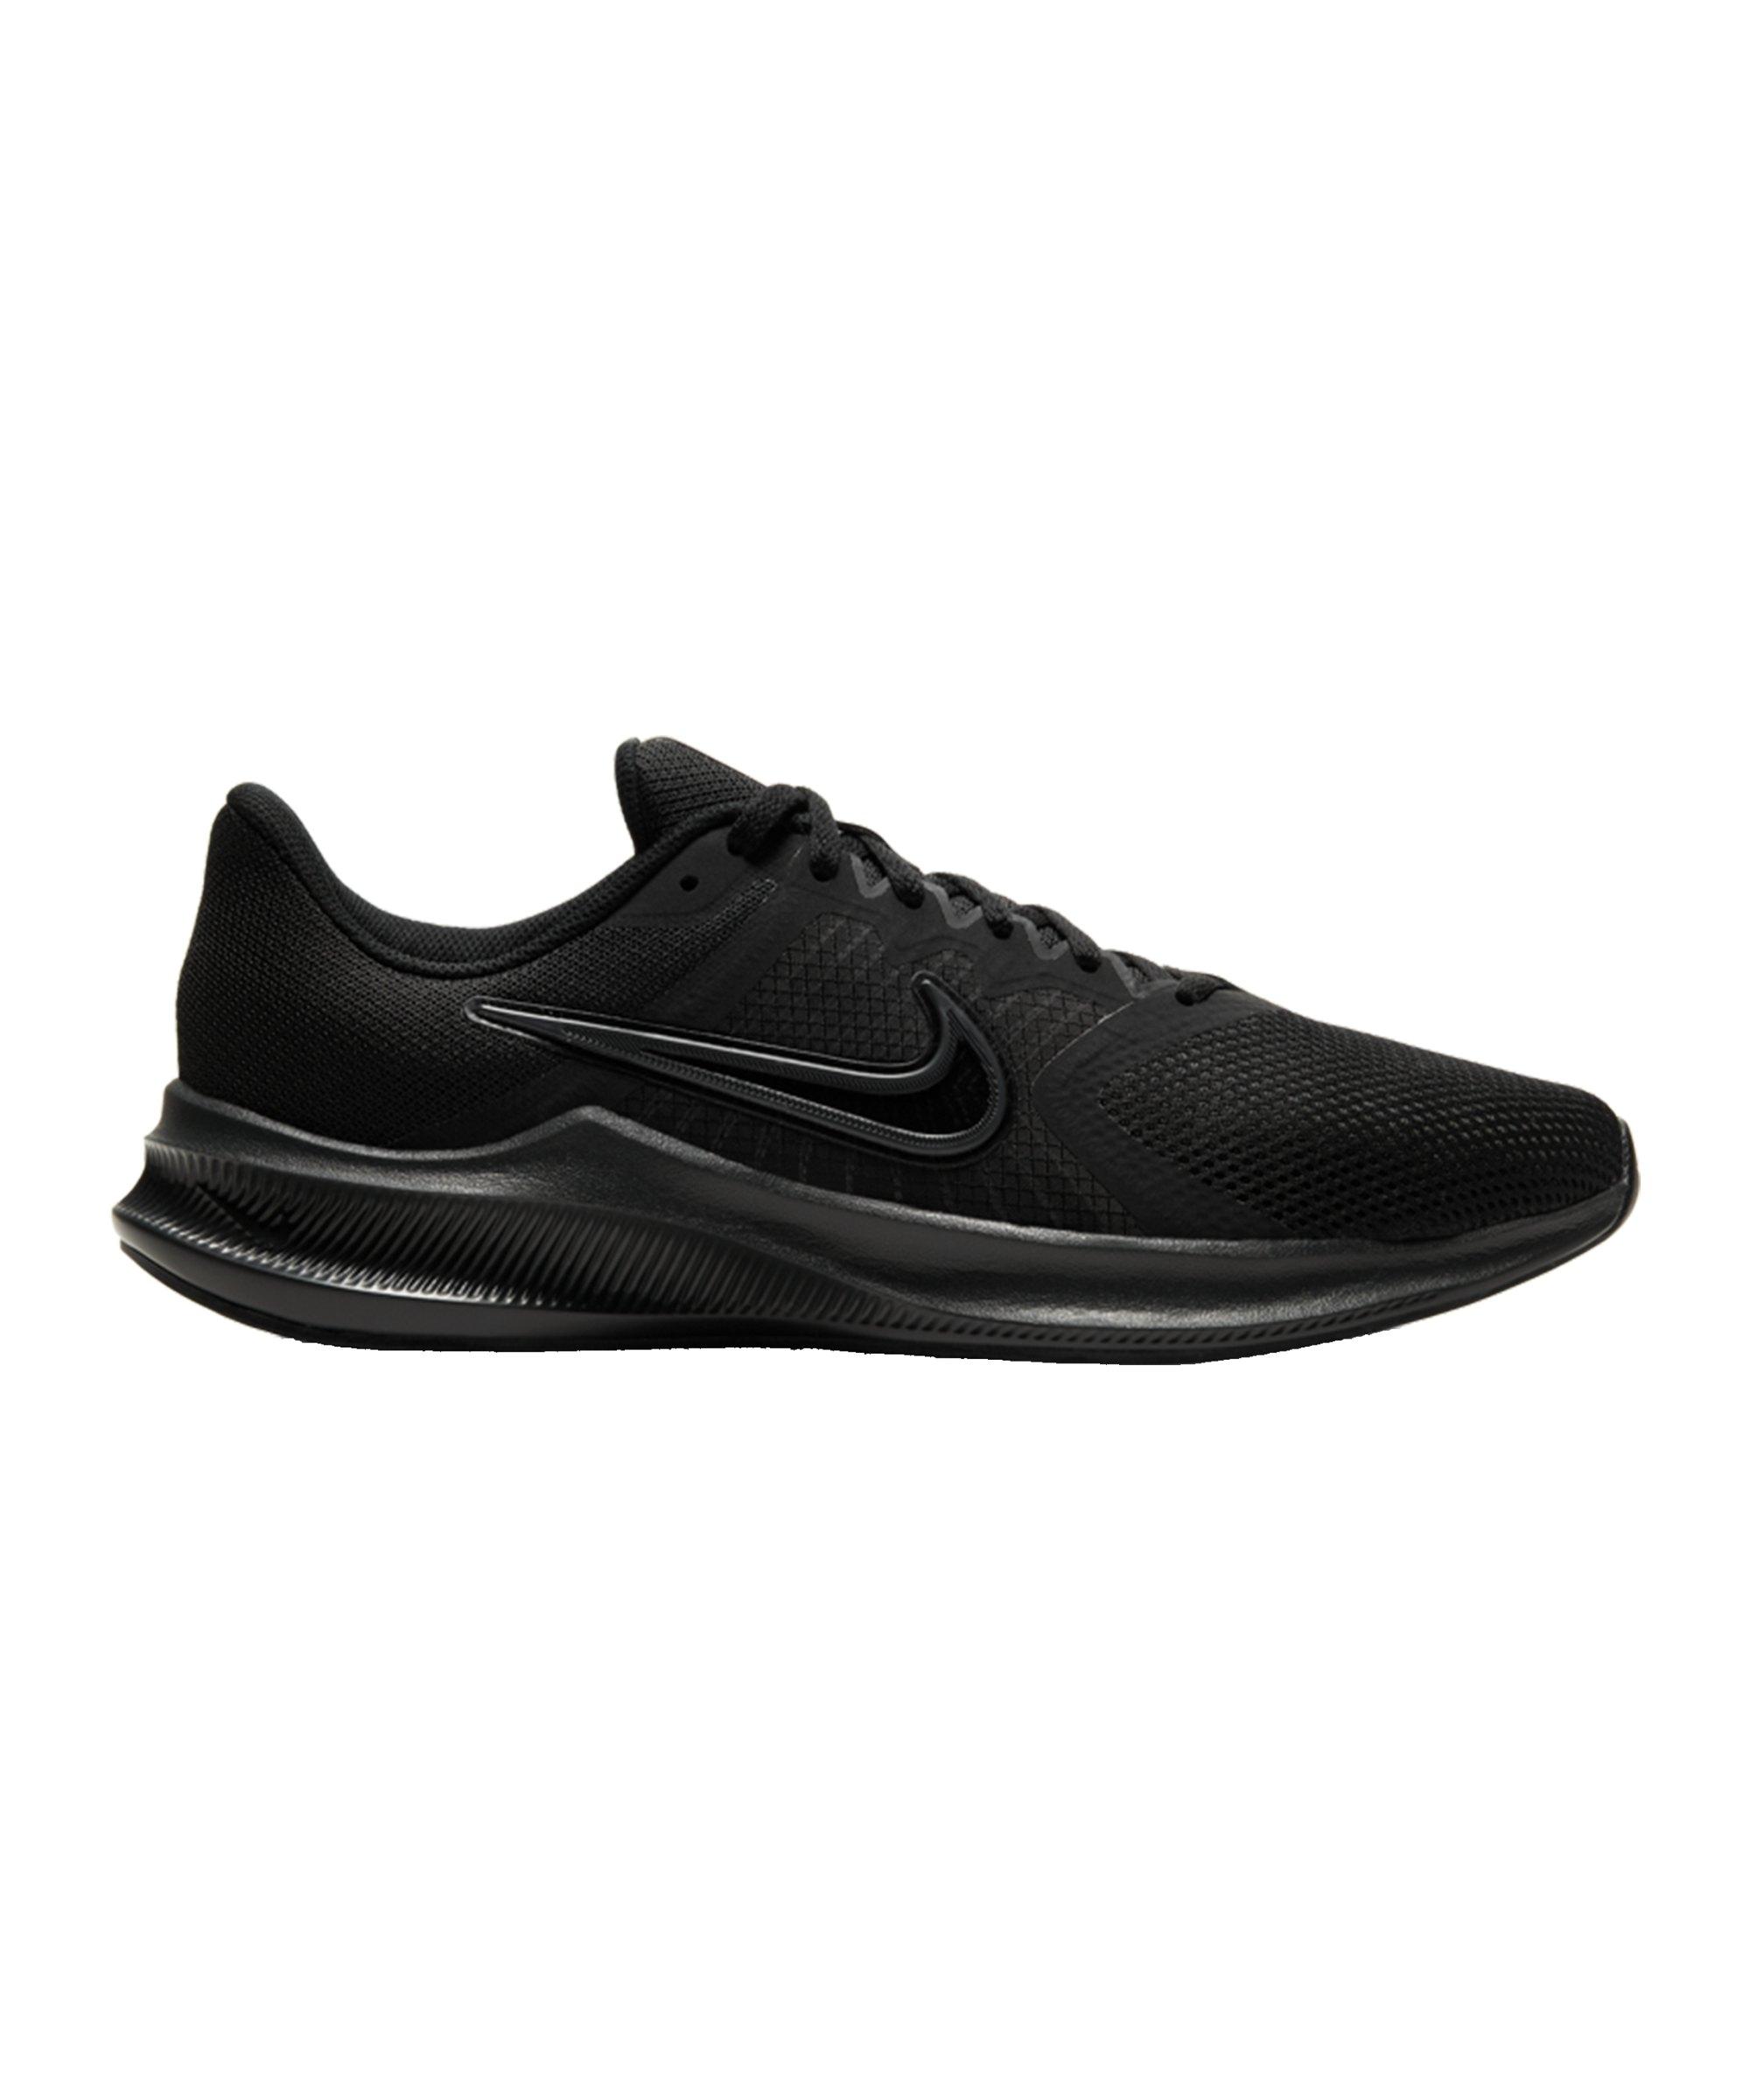 Nike Downshifter 11 Running Schwarz Grau F002 - schwarz